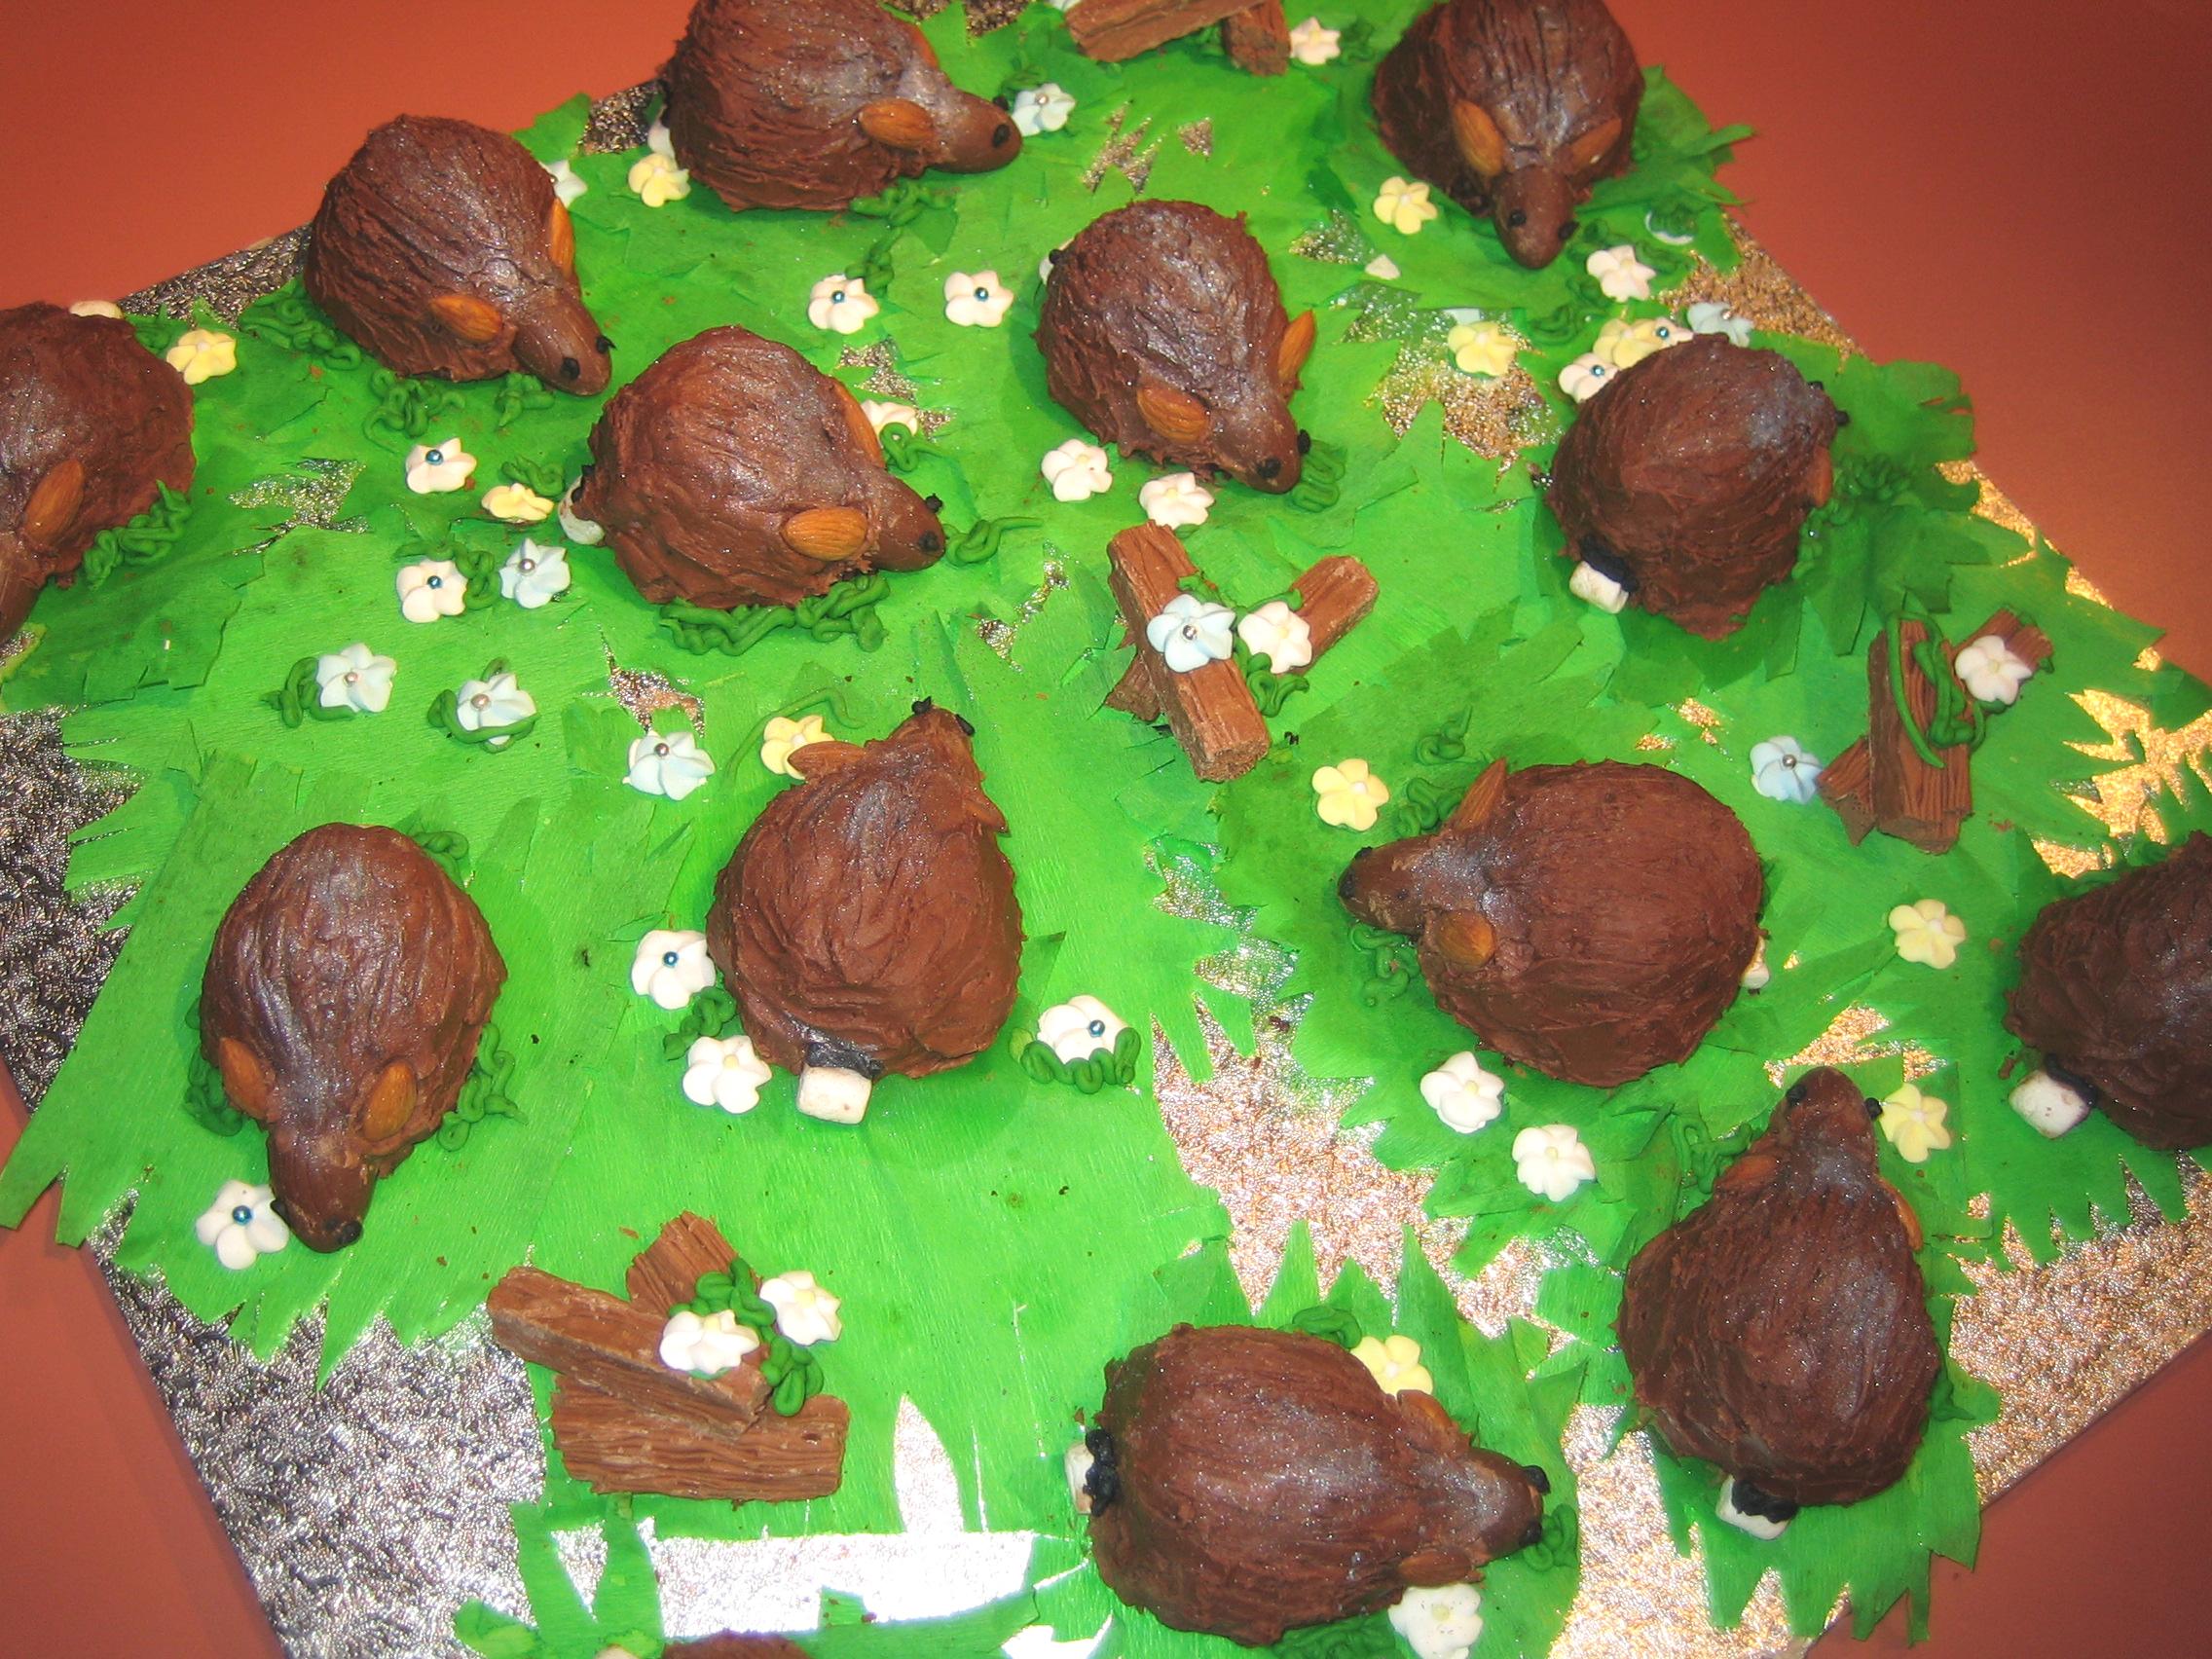 FREE CAKE FOR KIDS